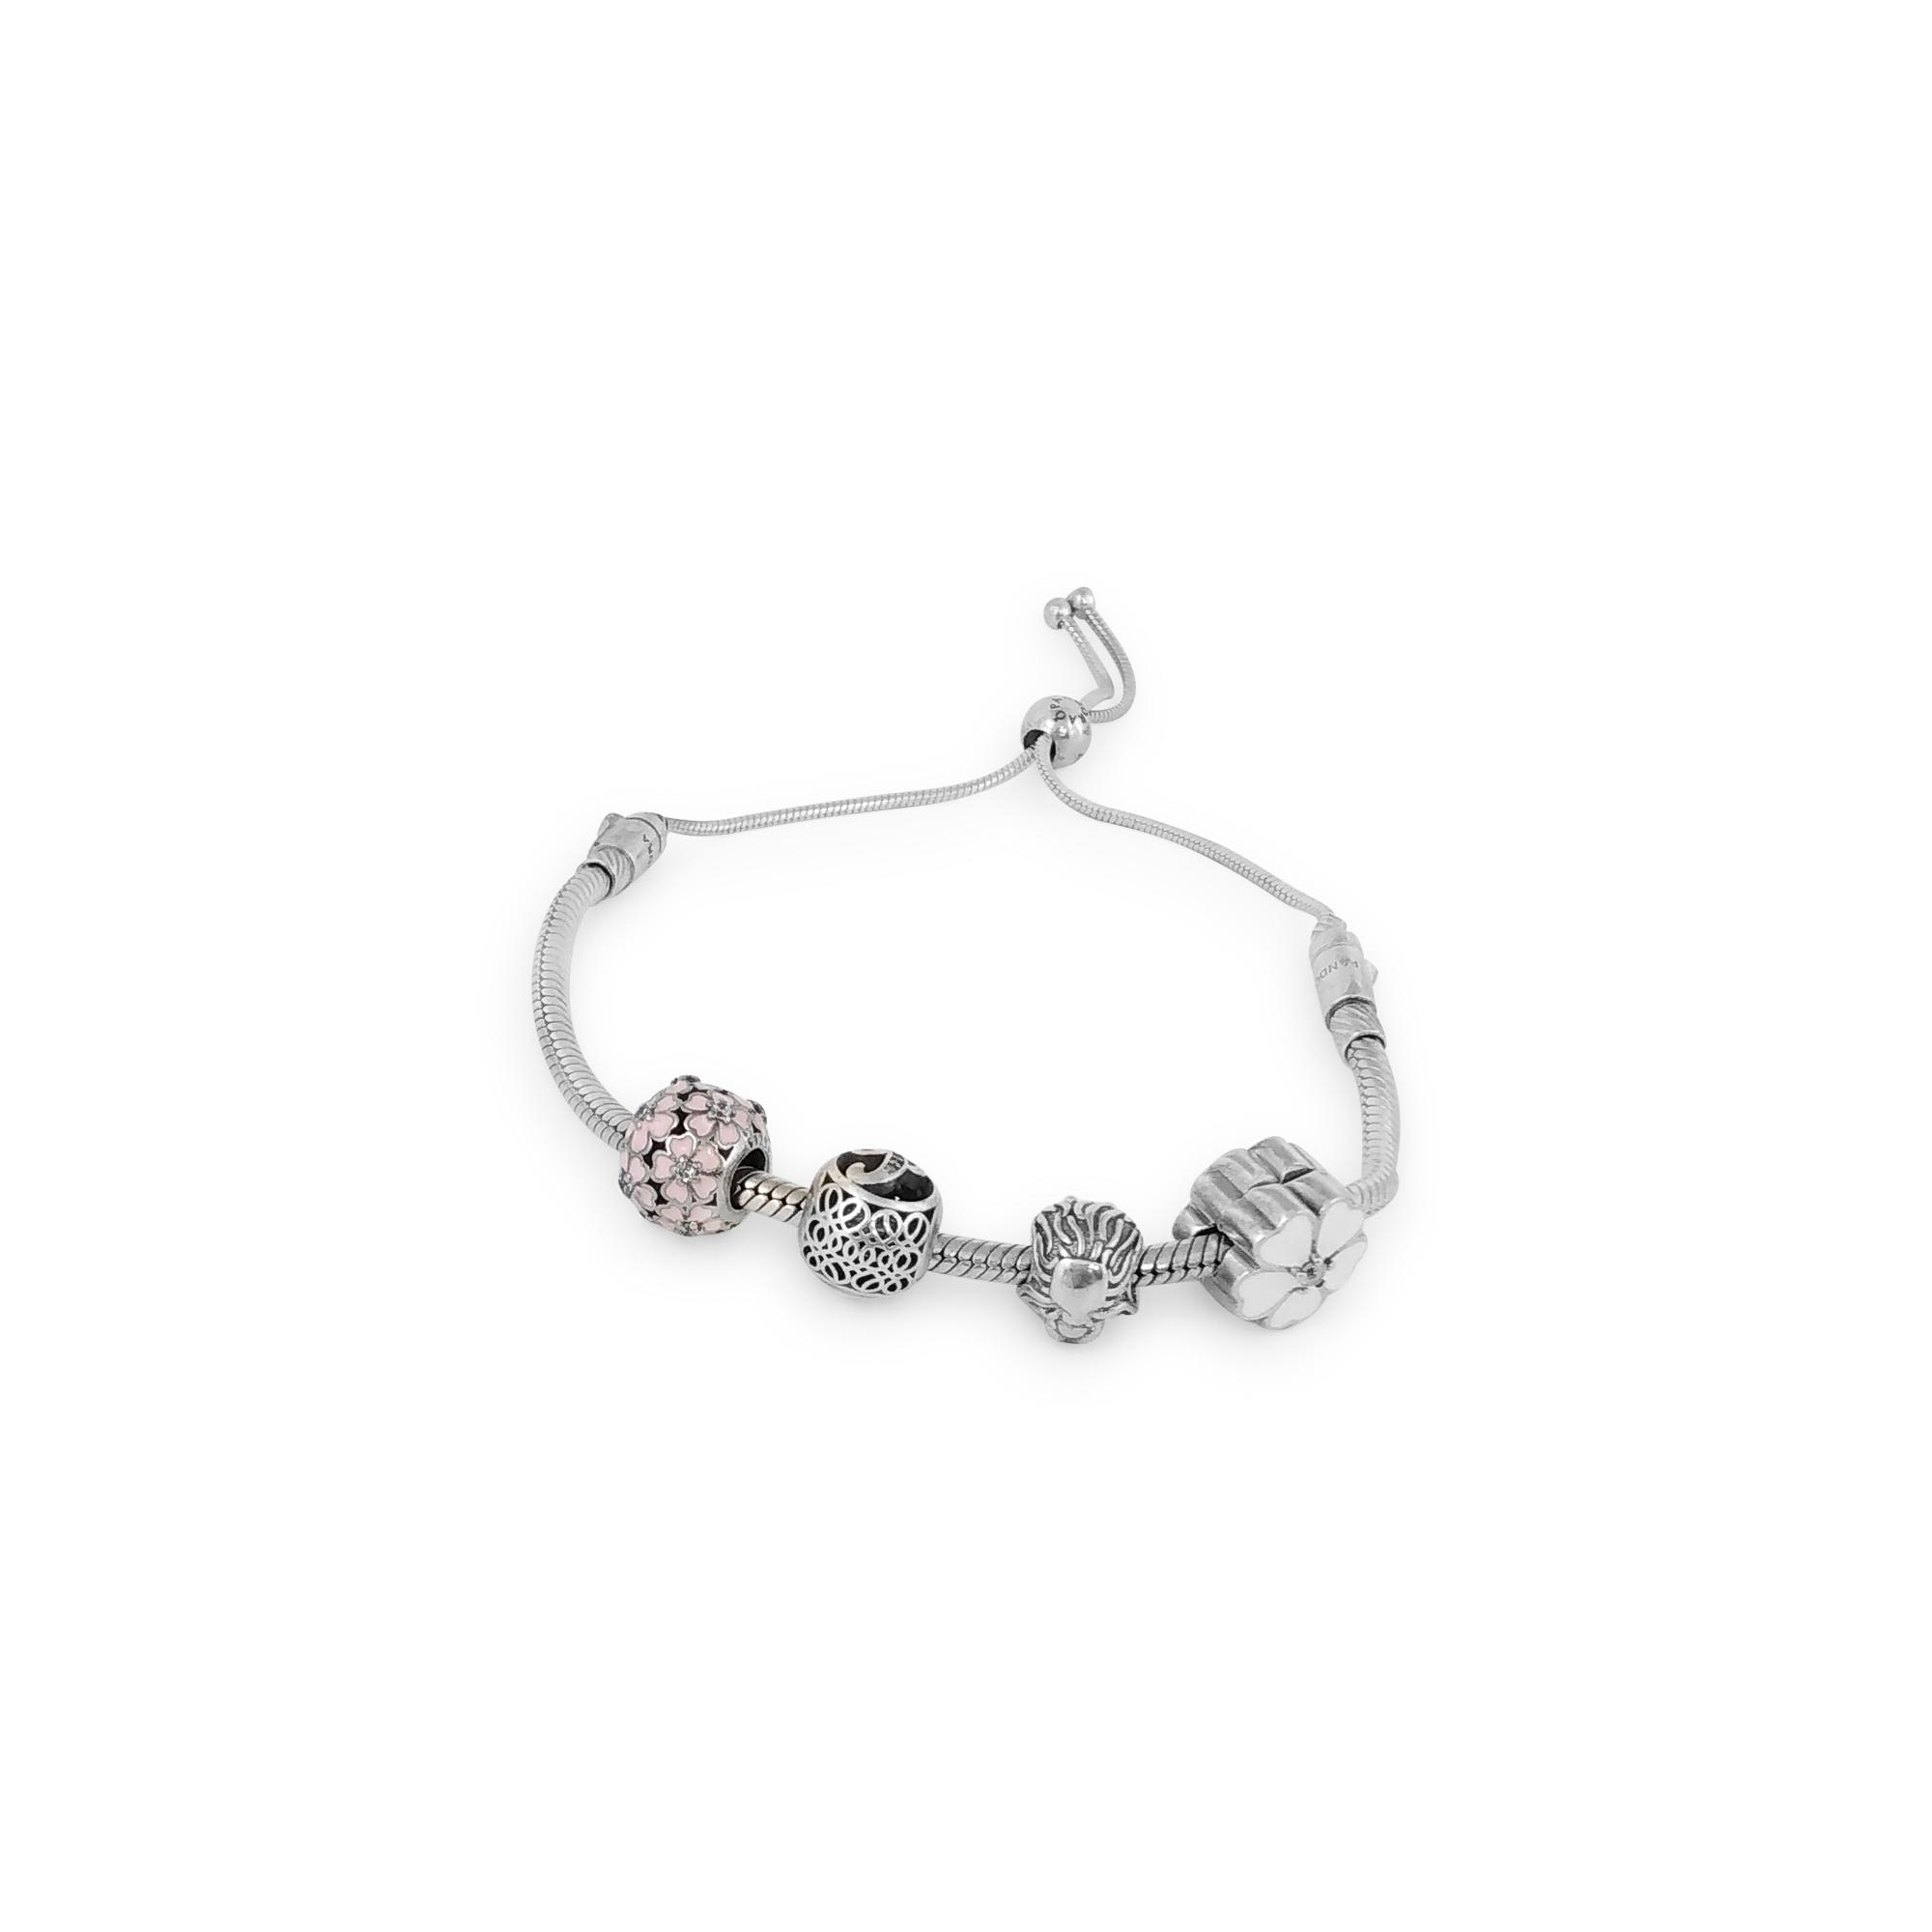 Floral Charm Bracelet in india